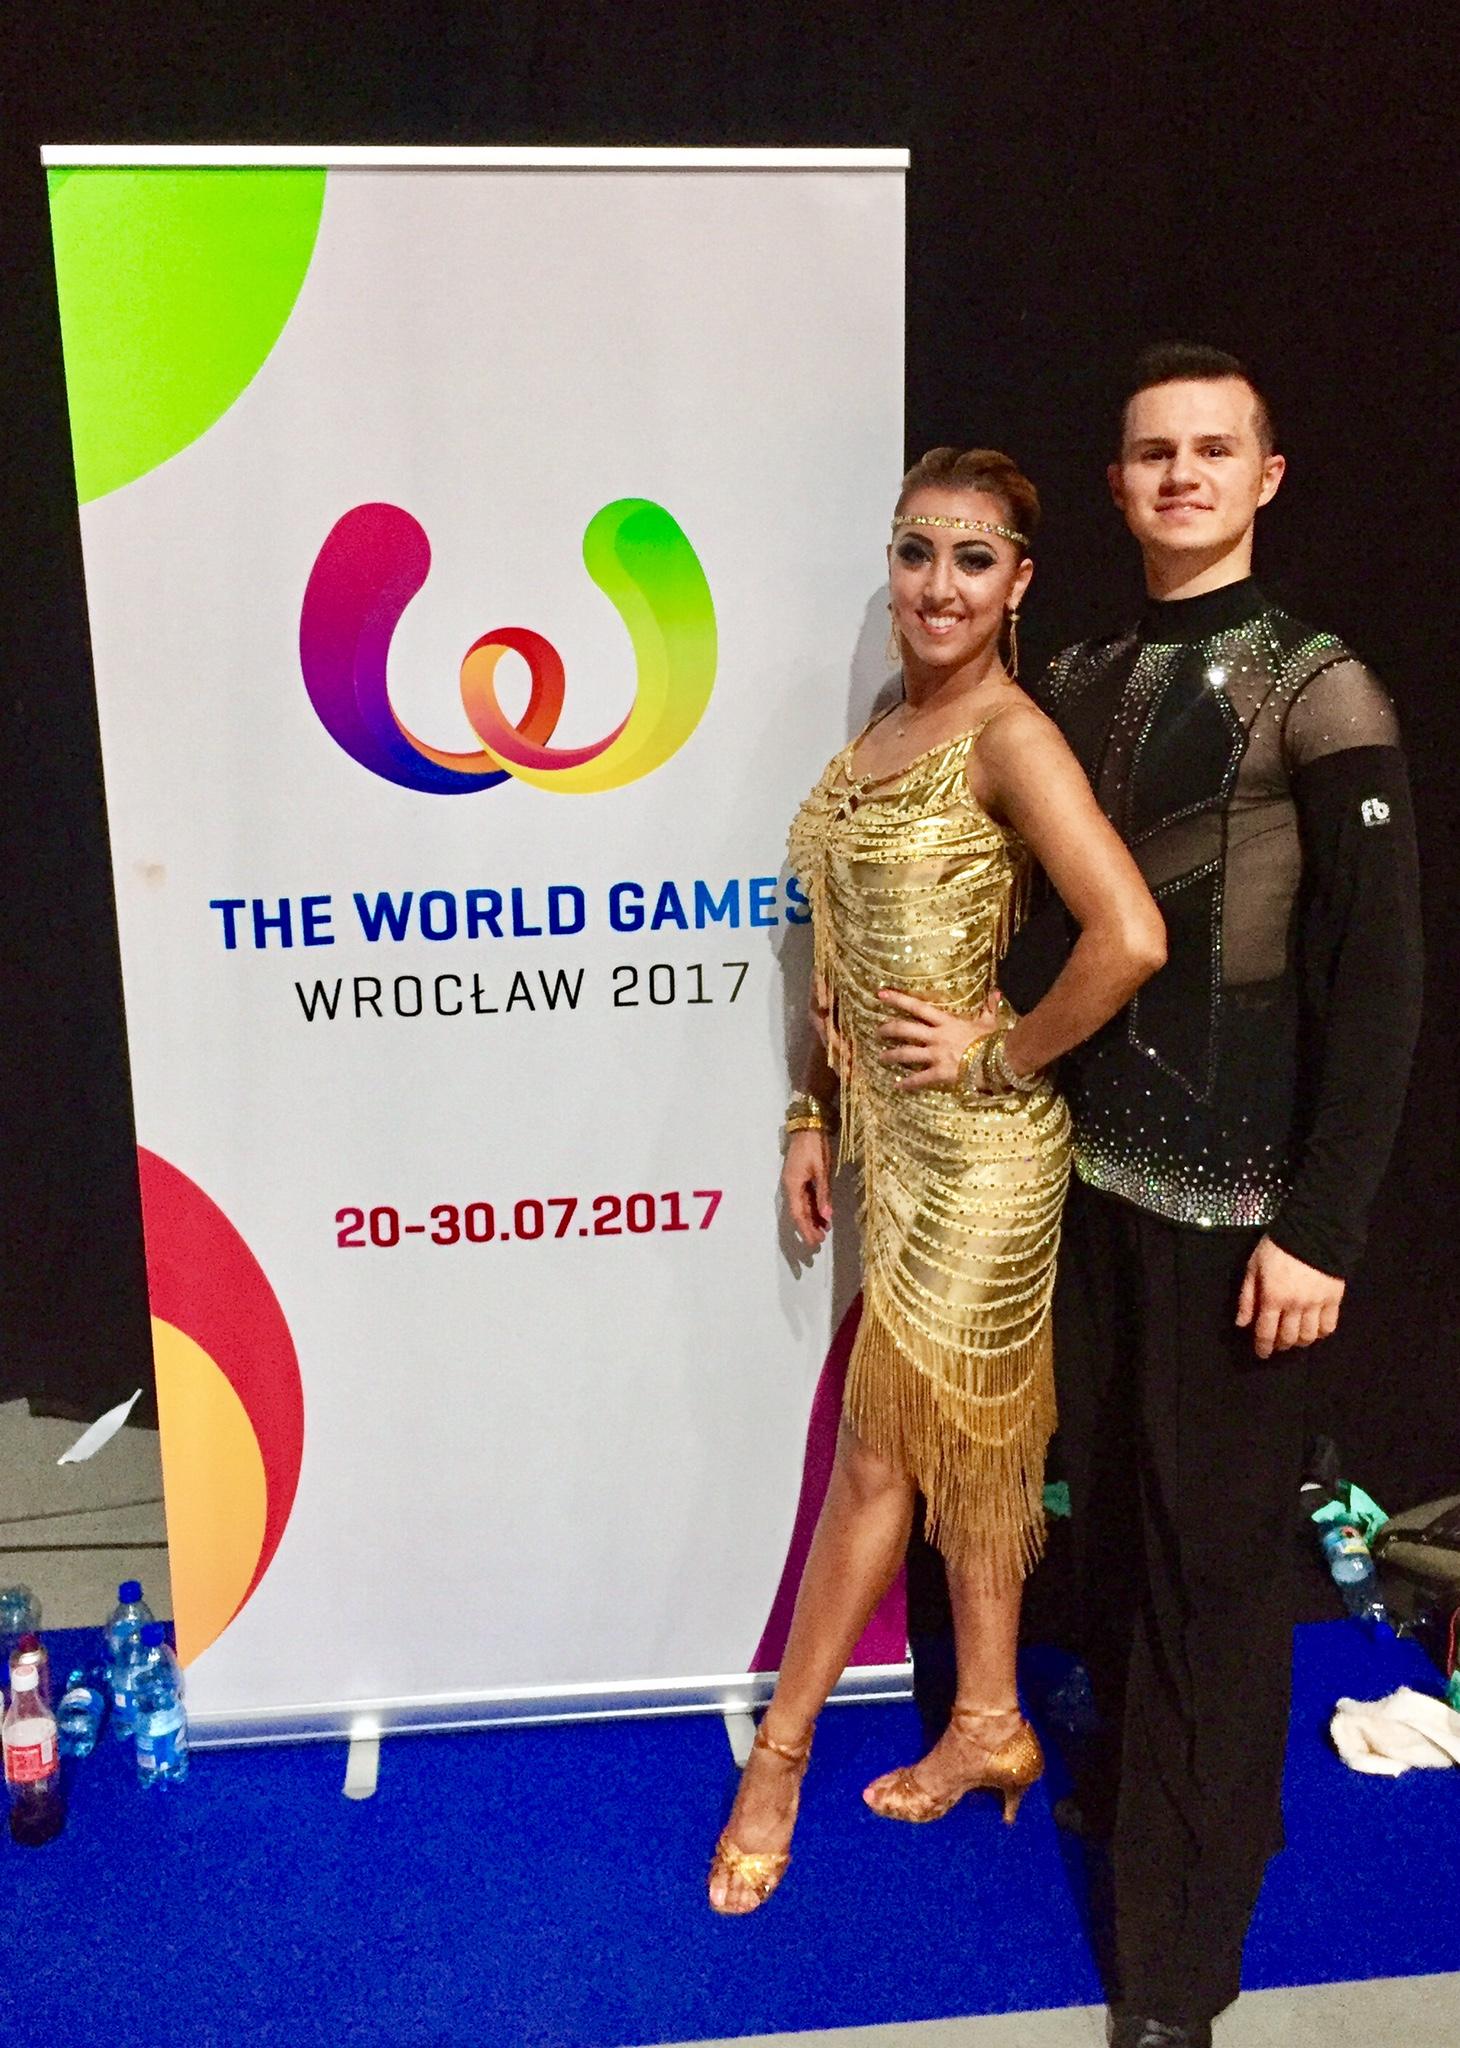 Sarah-Maude Thibaudeau et Daniel Zaharia - Jeux Mondiaux en danse sportive 2017 in Wroclaw, Poland